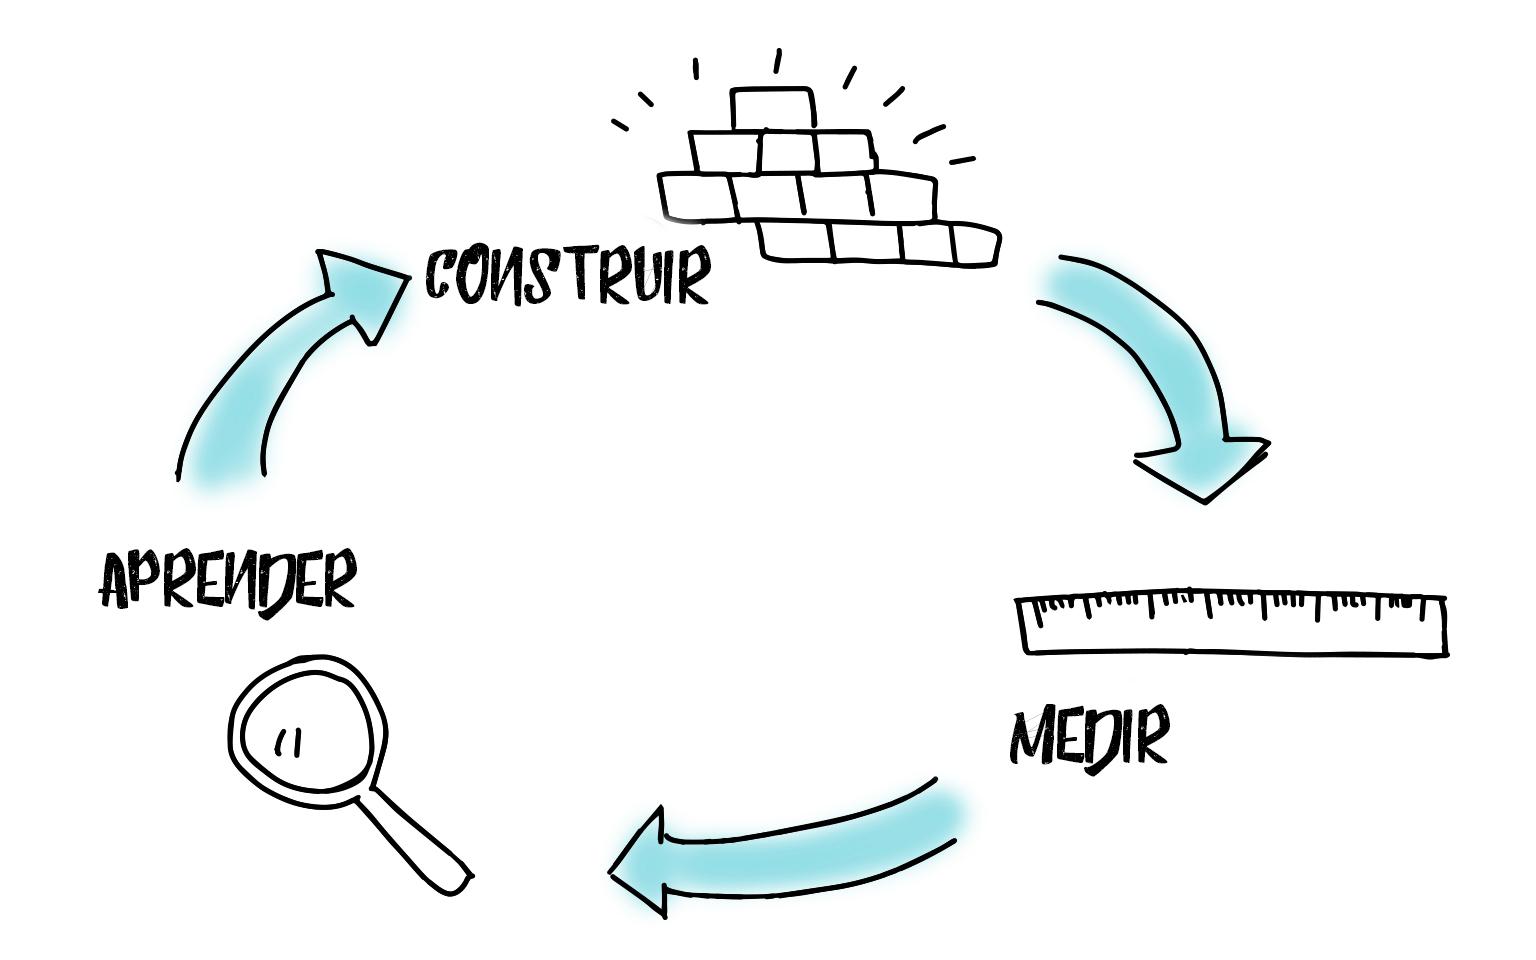 Construir, Medir, Aprender. Lean Startup (Eric Ries)